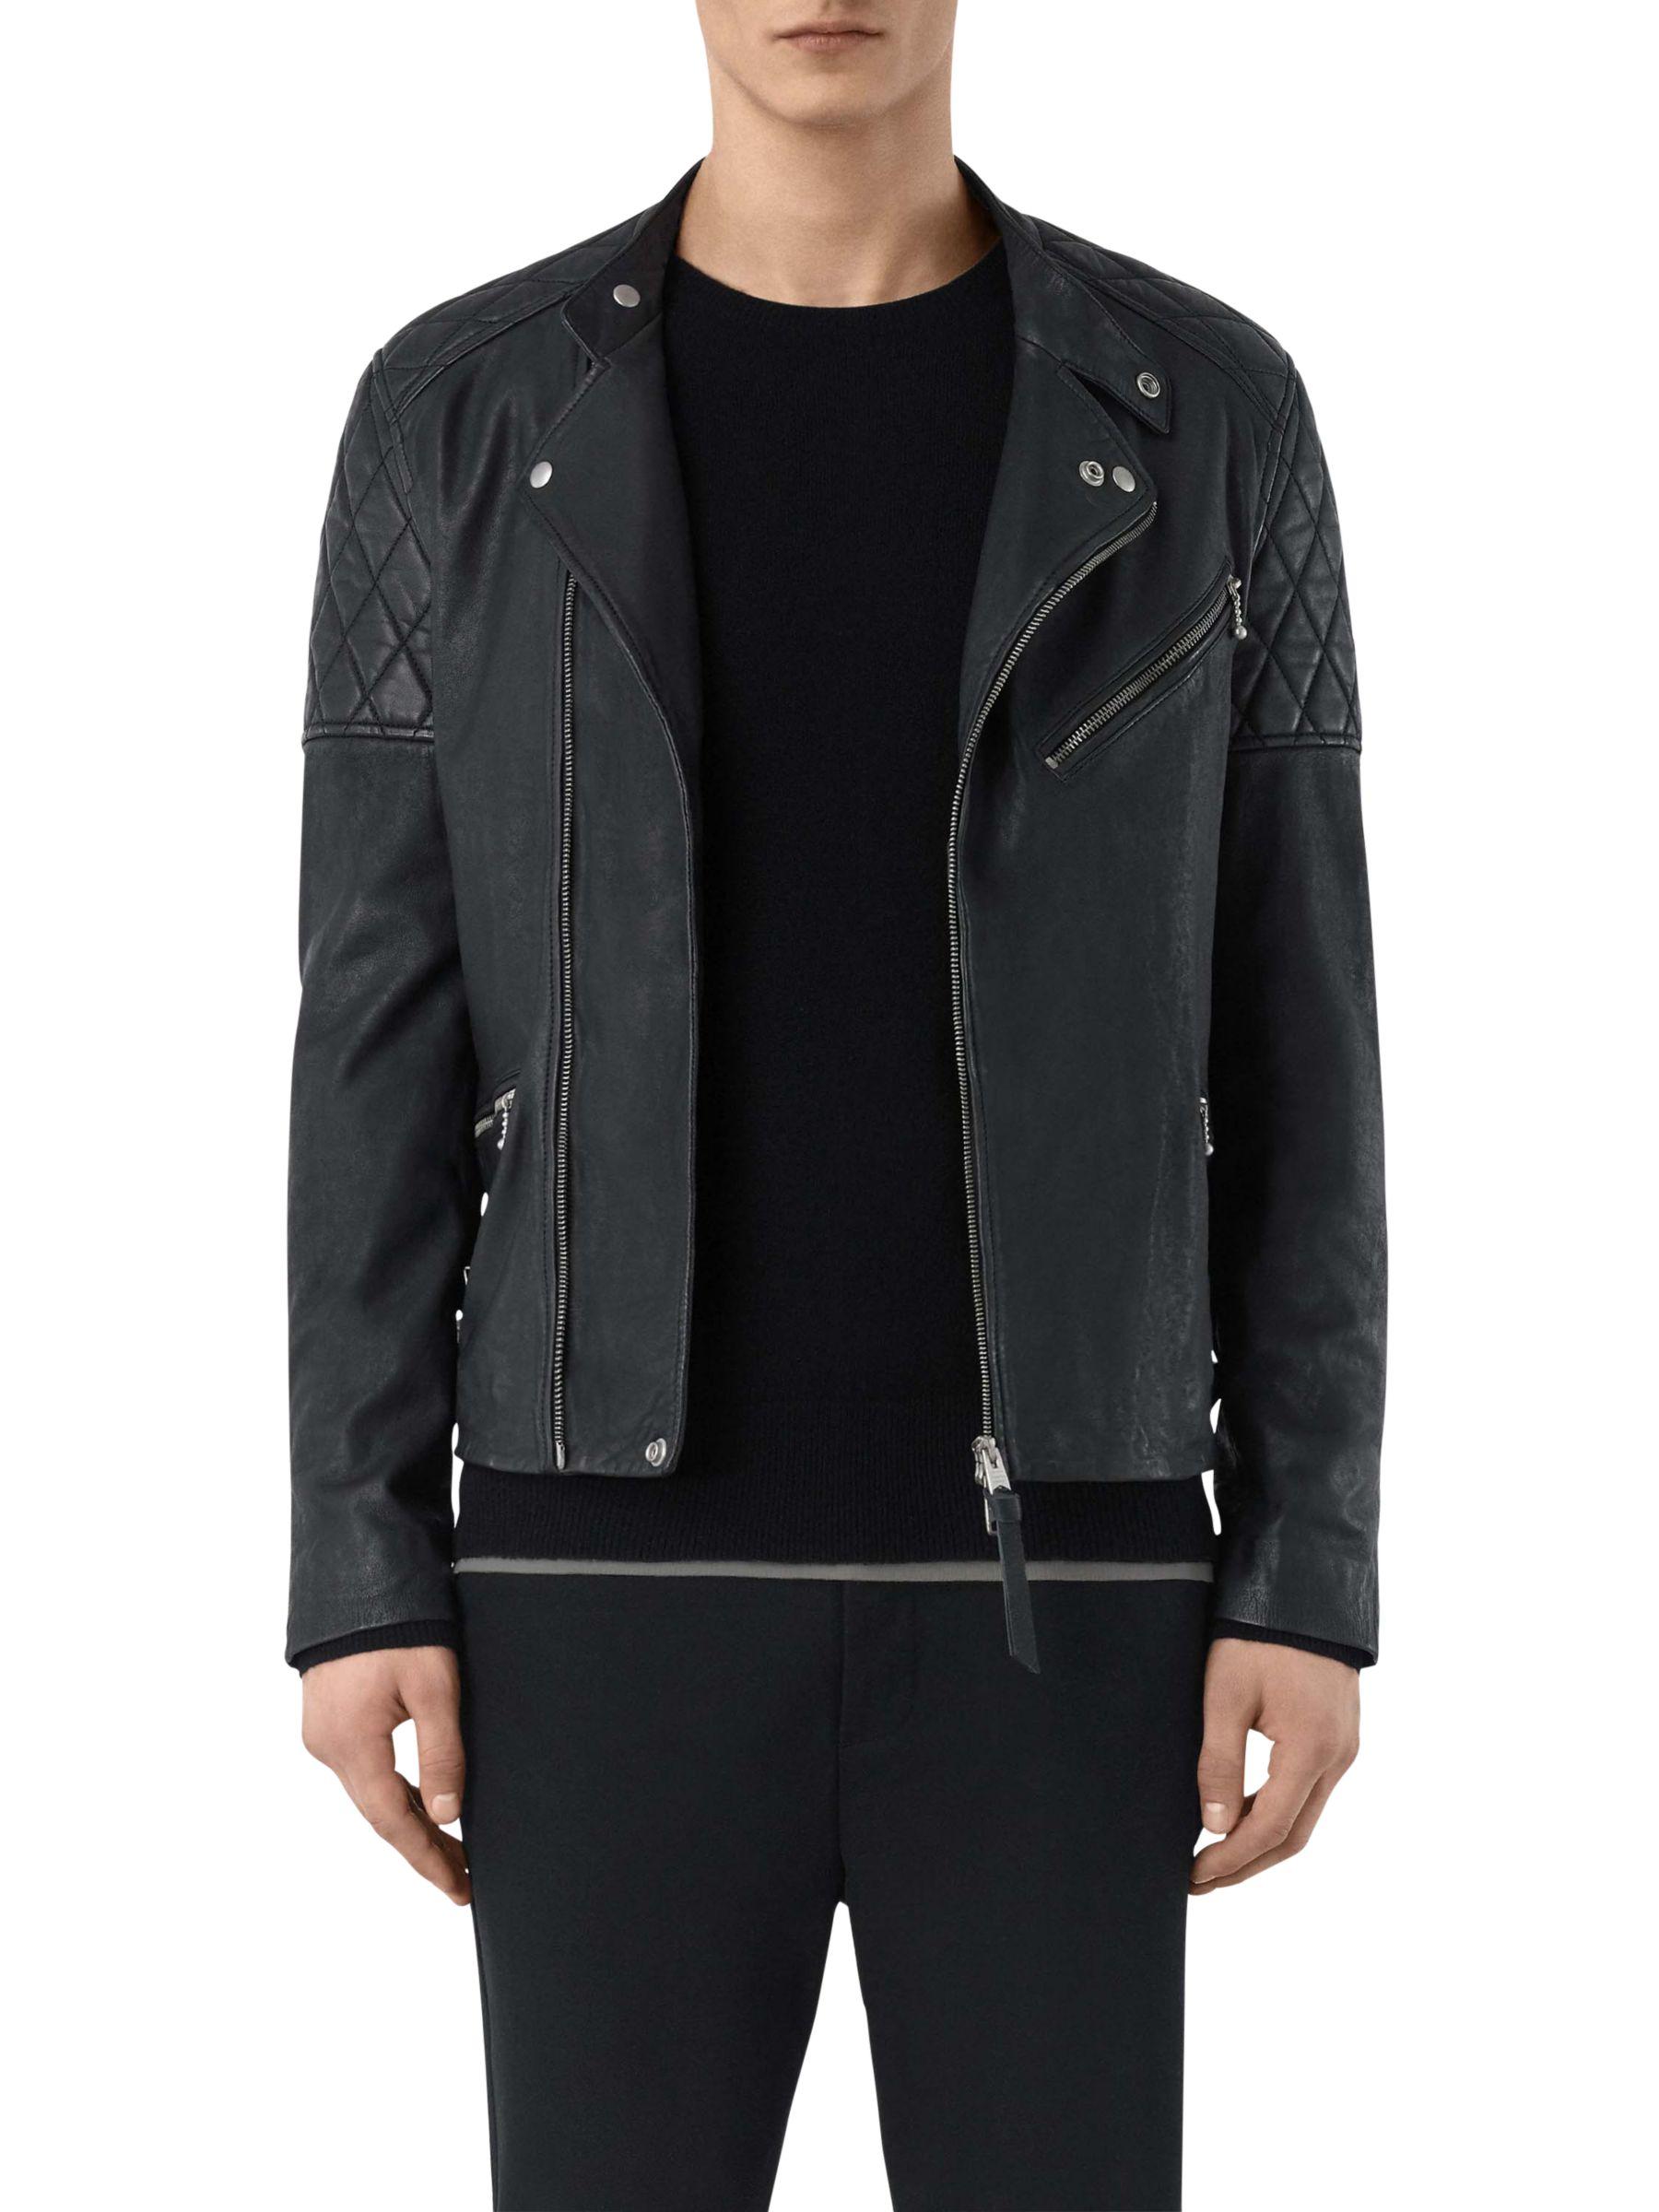 AllSaints AllSaints Den Biker Leather Jacket, Ink Navy